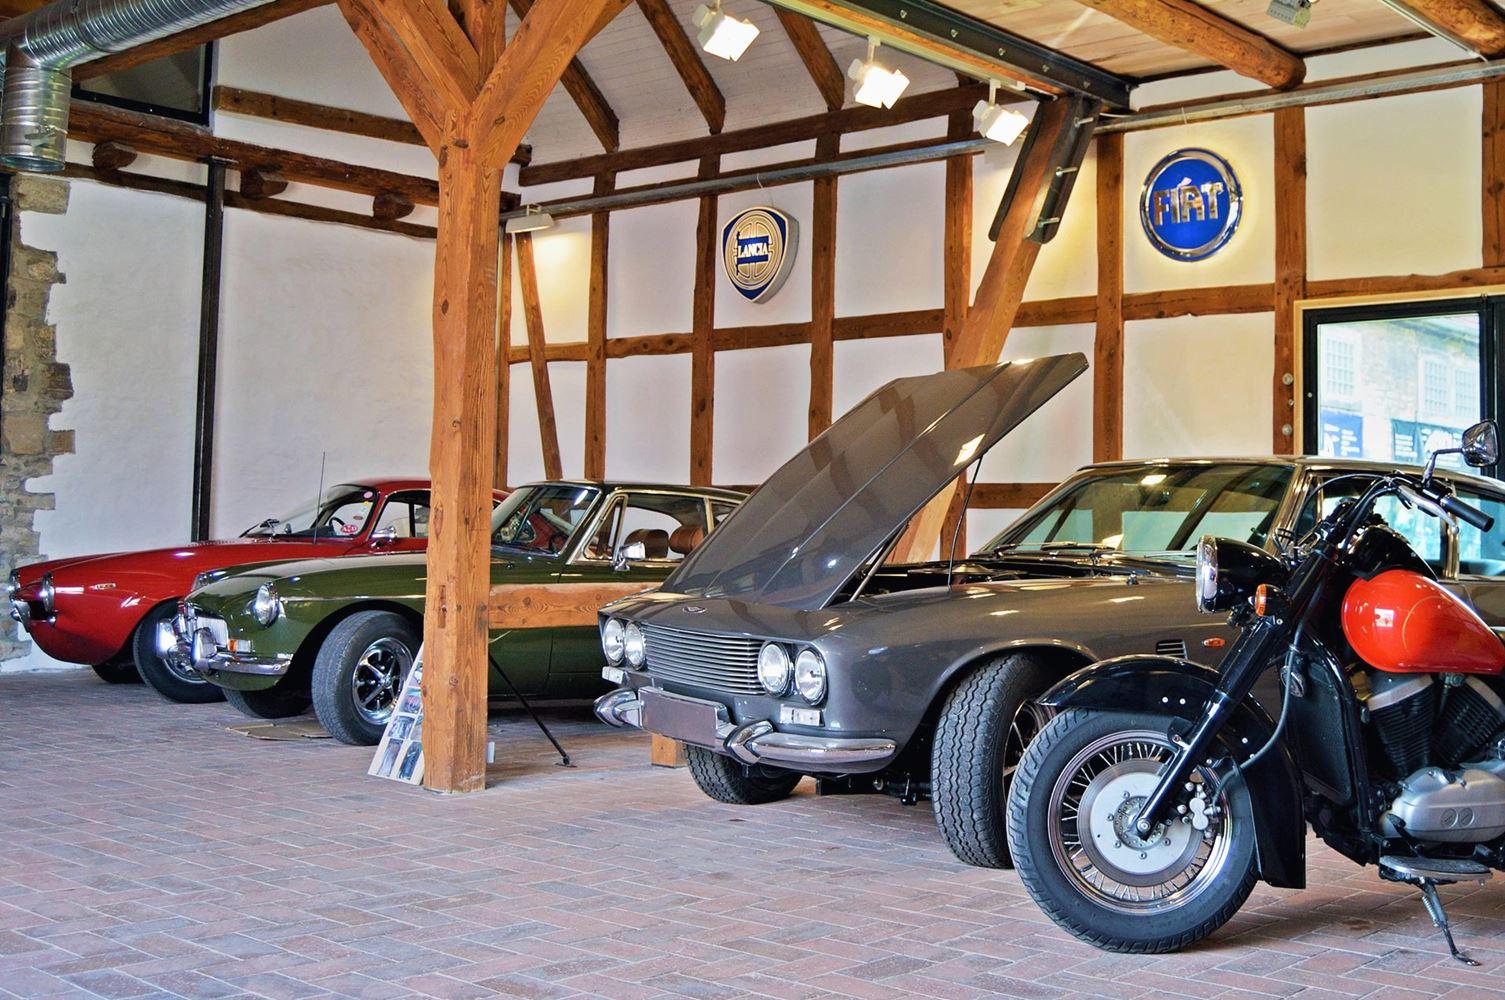 Arnold Classic Oldtimer Showroom in Lauenau